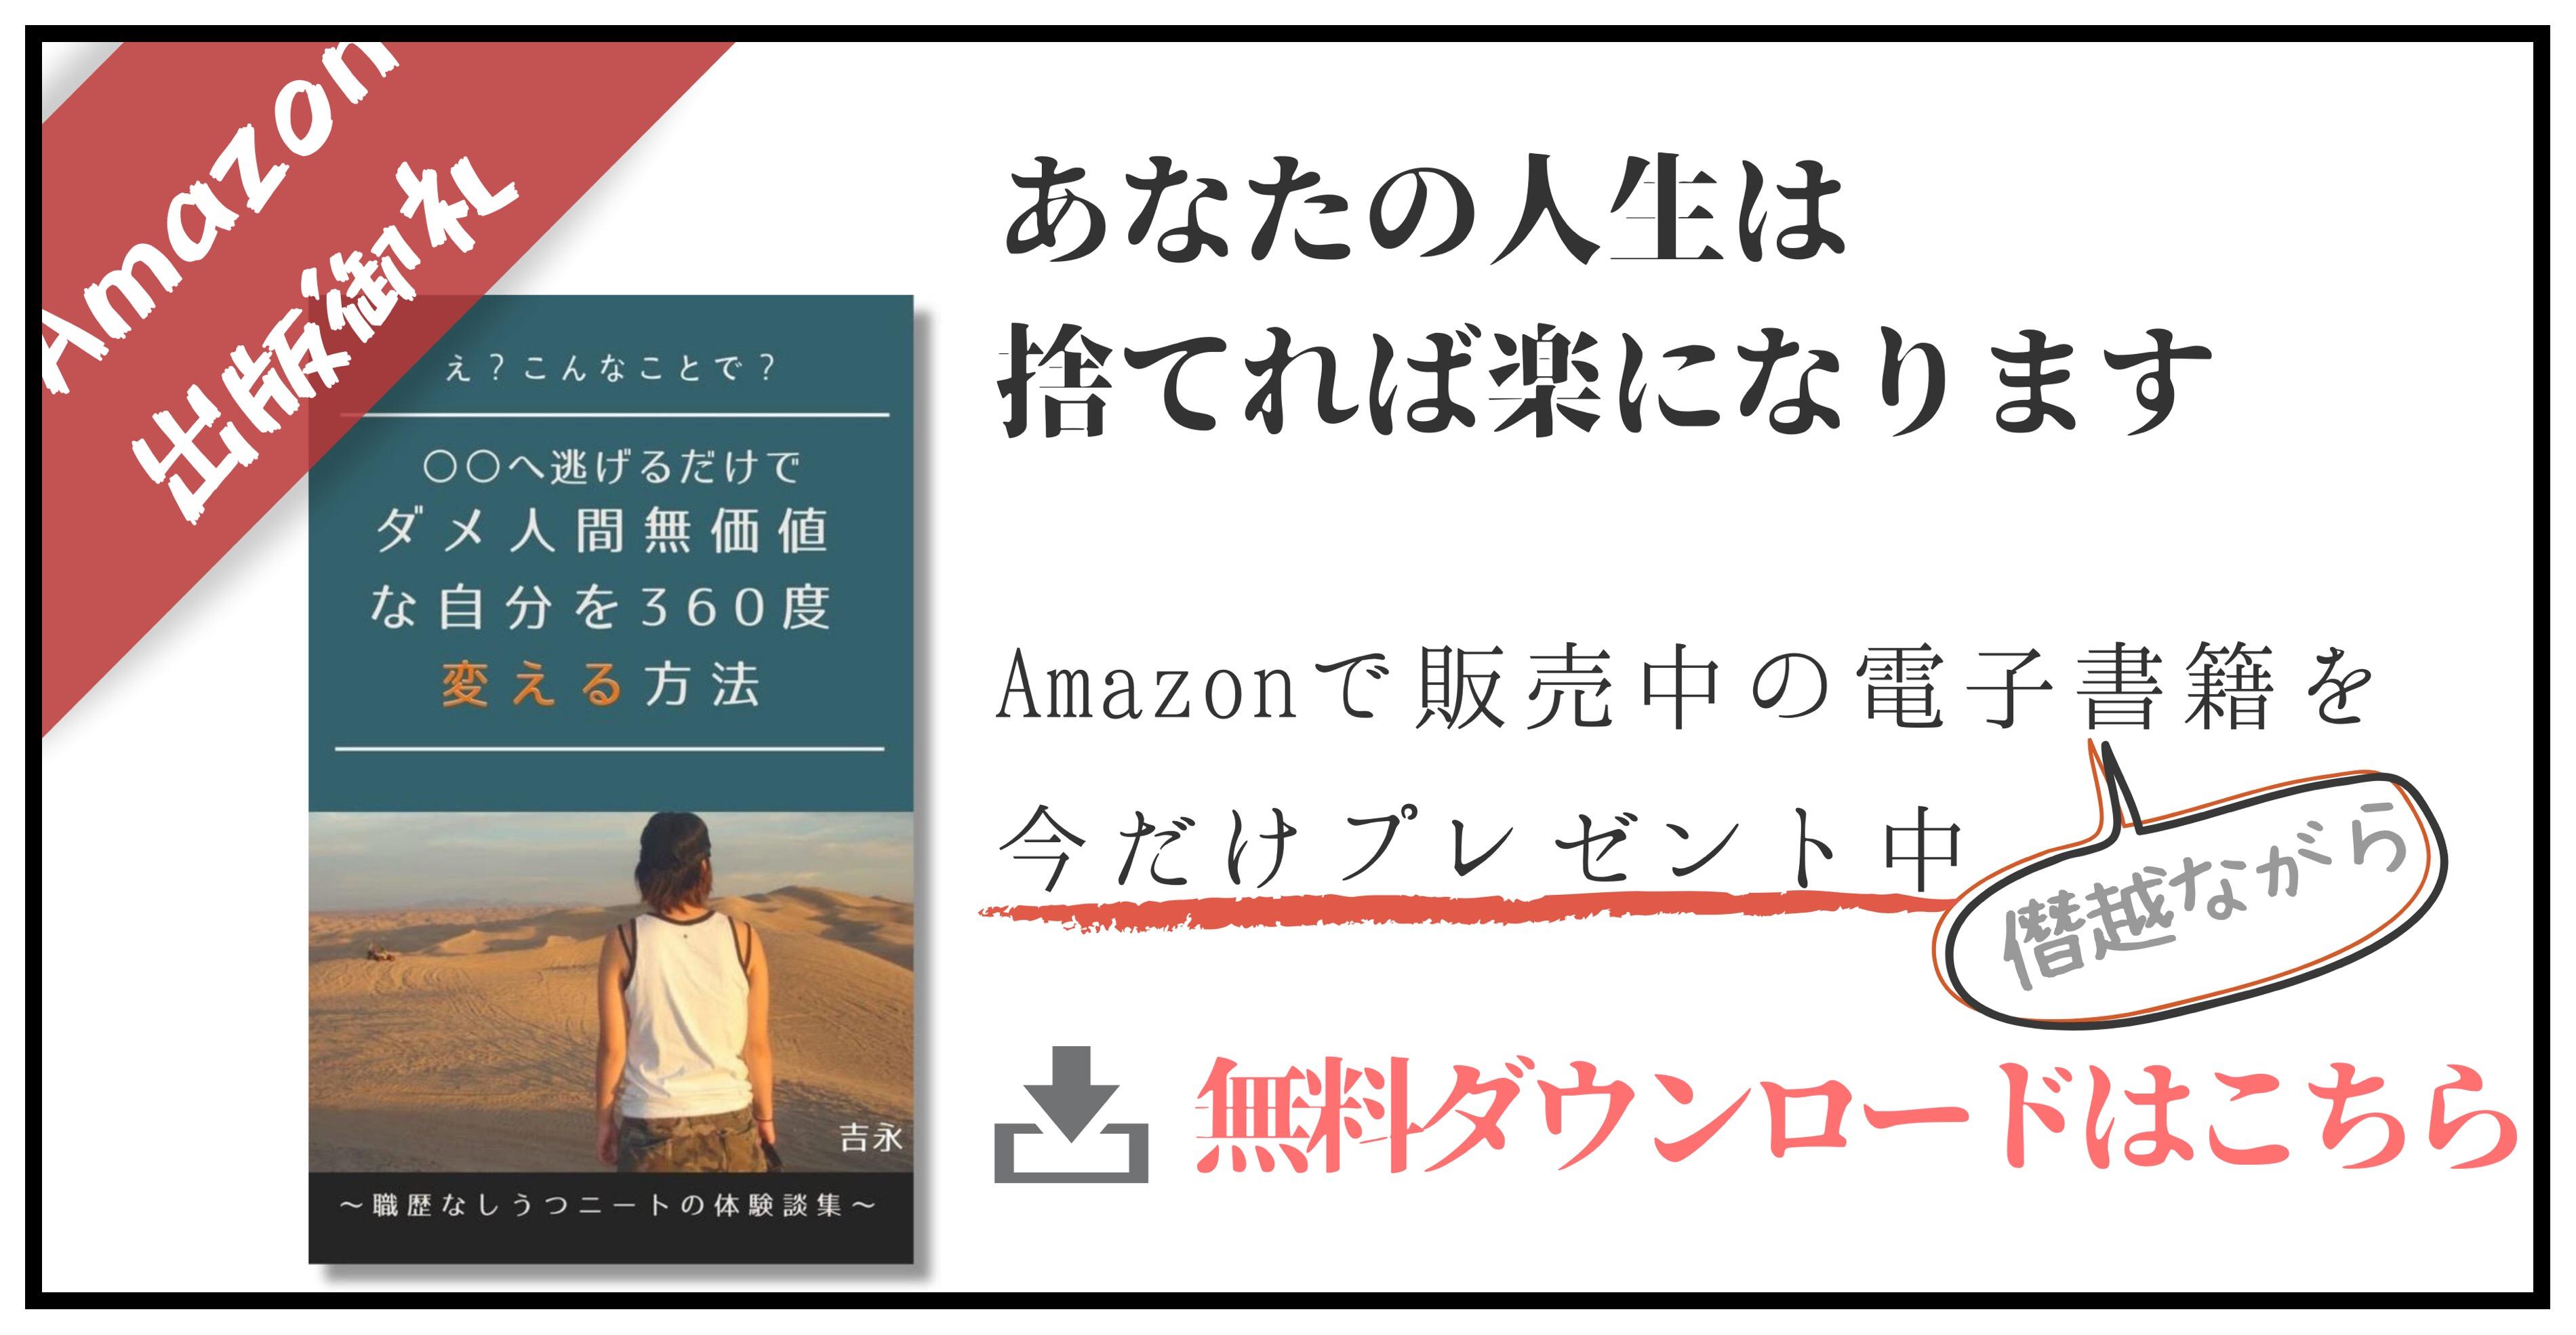 Amazon電子書籍プレゼントバナー